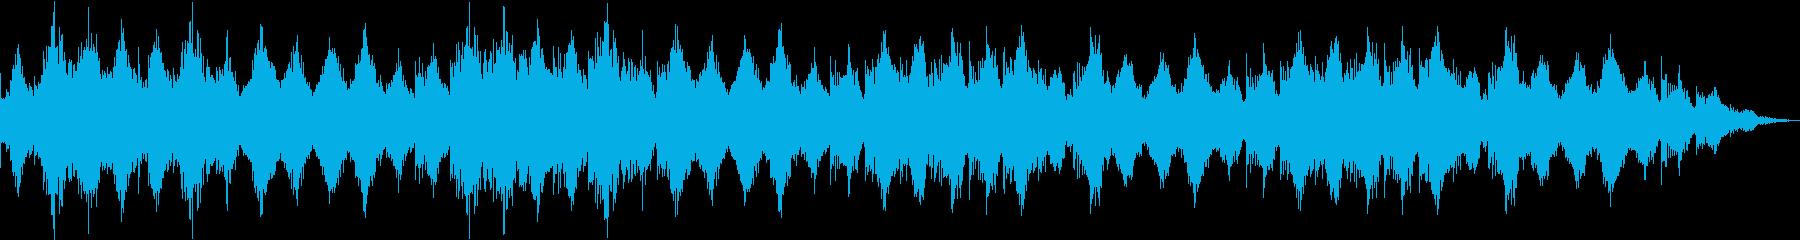 444Hzにチューニングされた癒やしの音の再生済みの波形